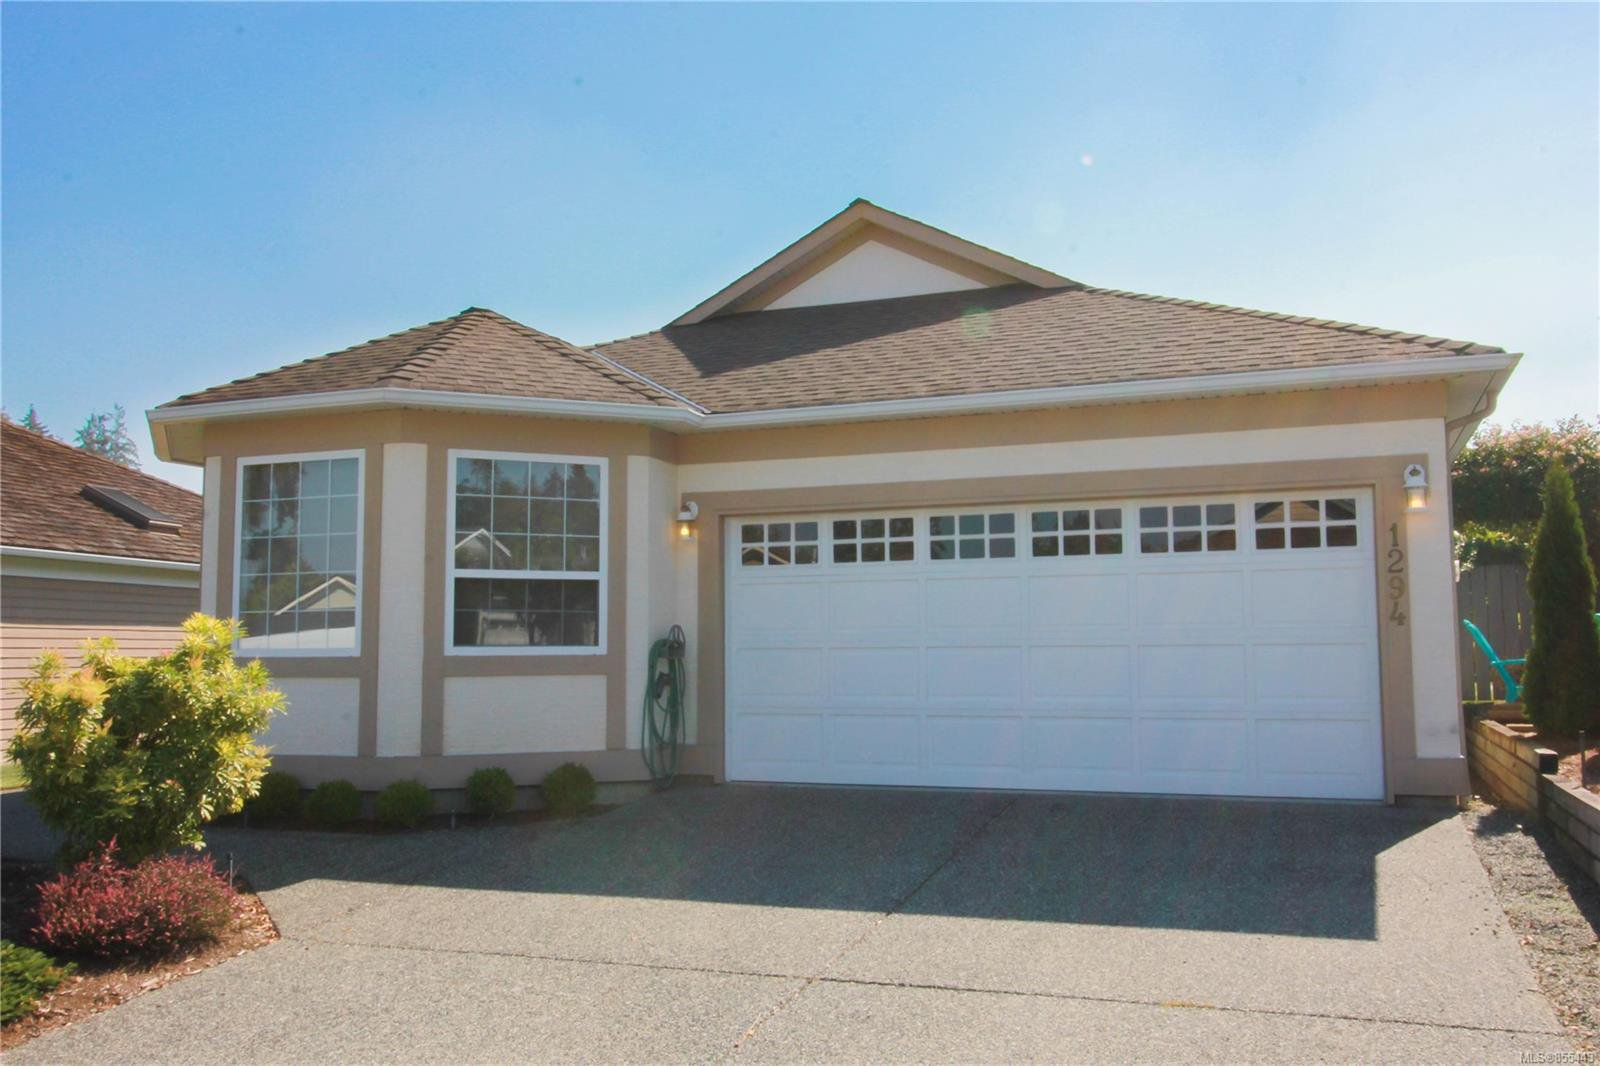 Main Photo: 1294 Leeward Way in : PQ Qualicum Beach House for sale (Parksville/Qualicum)  : MLS®# 855443